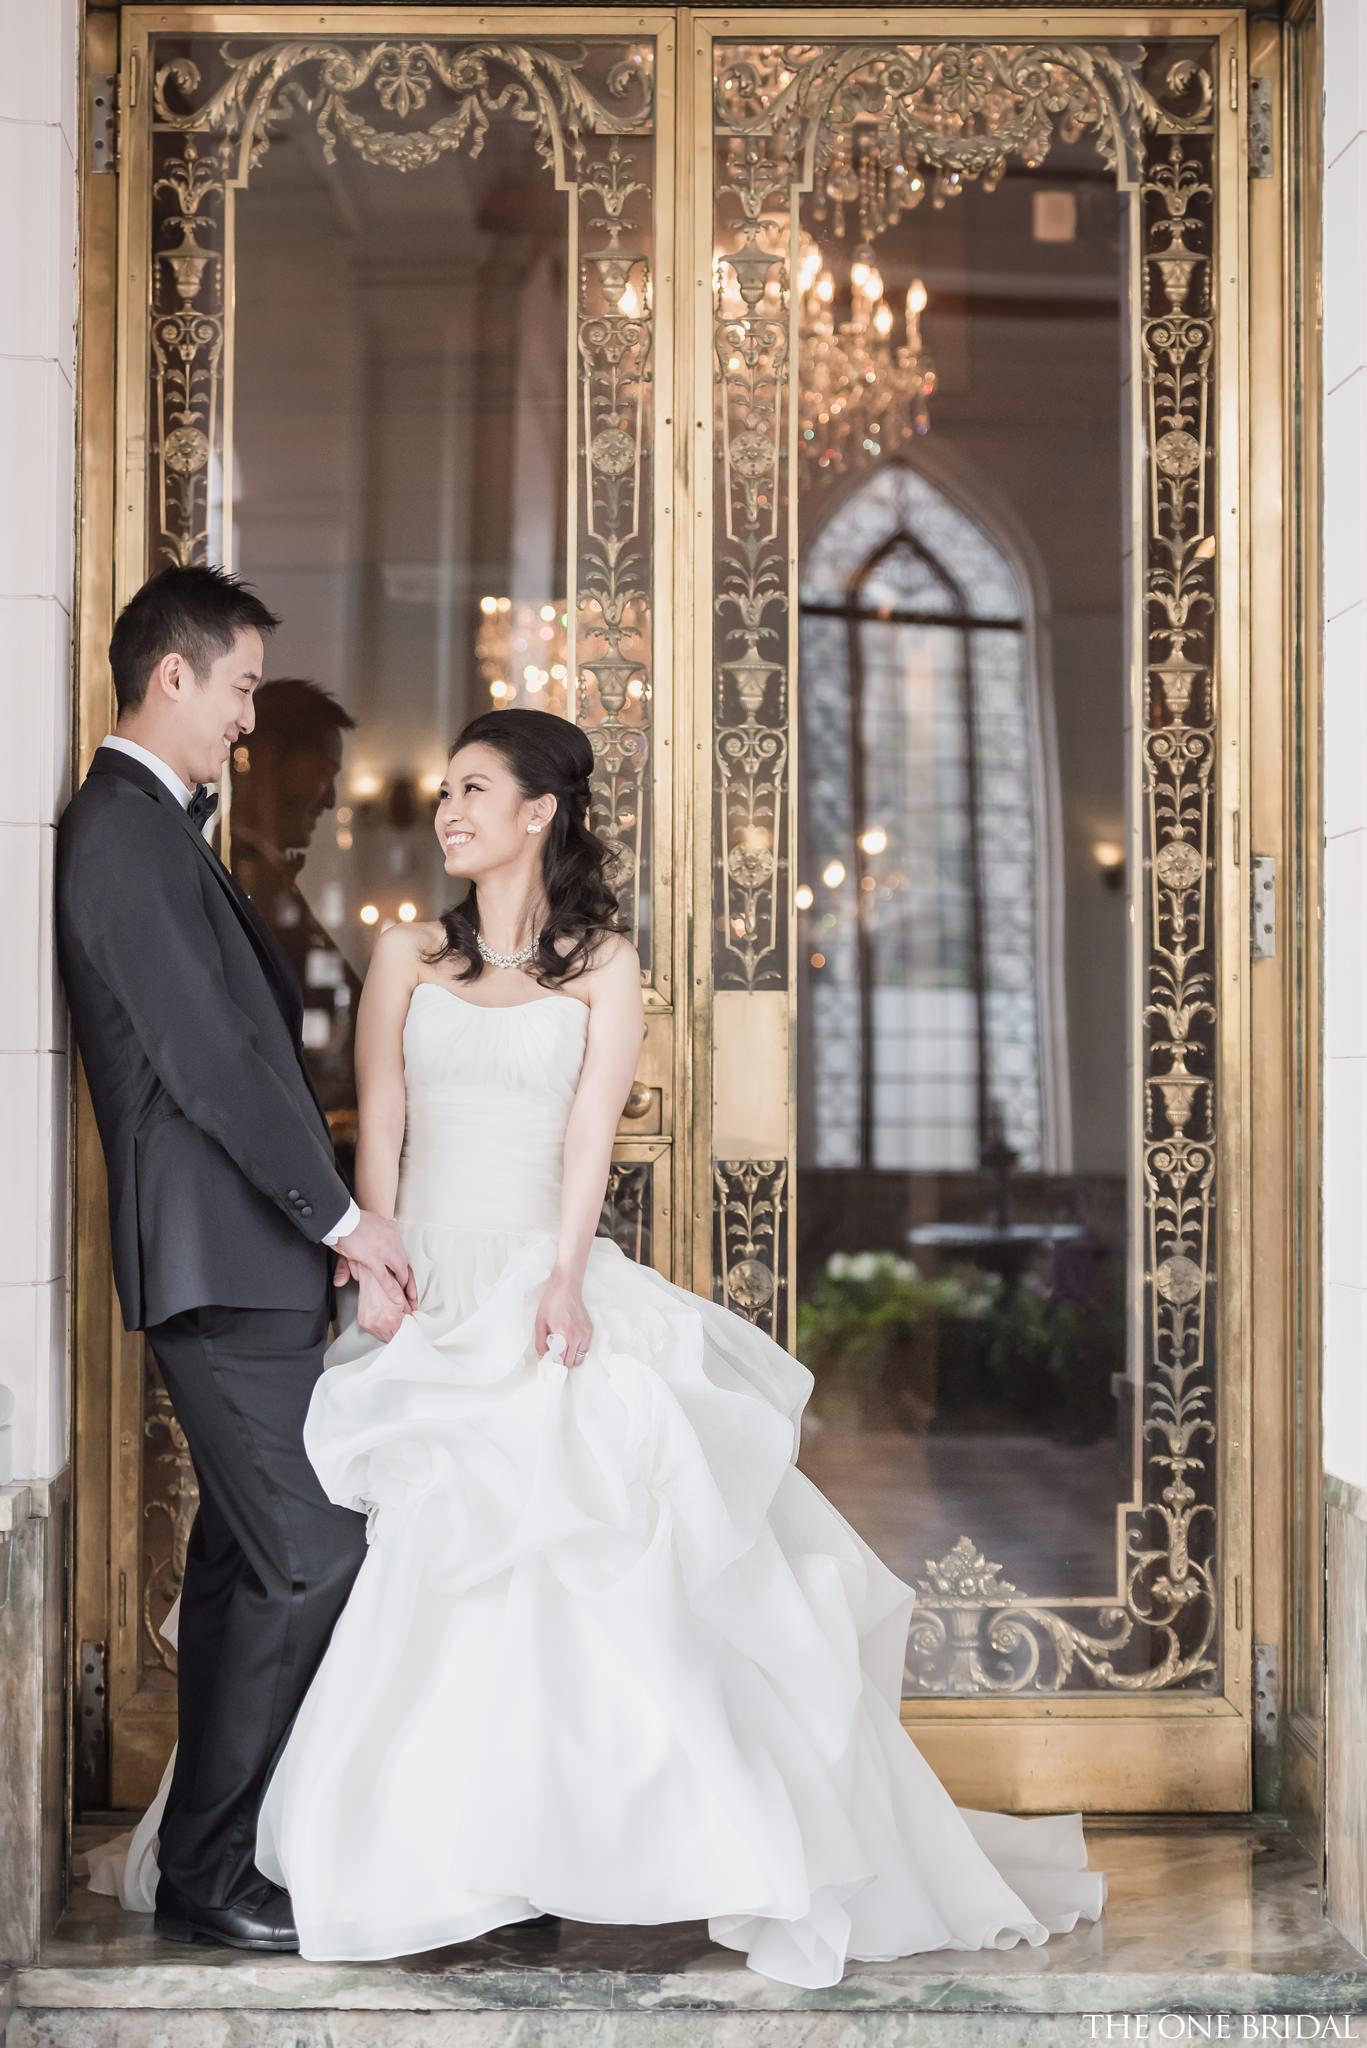 ball-gown-wedding-dress-pre-wedding-photography-casa-loma-toronto-the-one-bridal